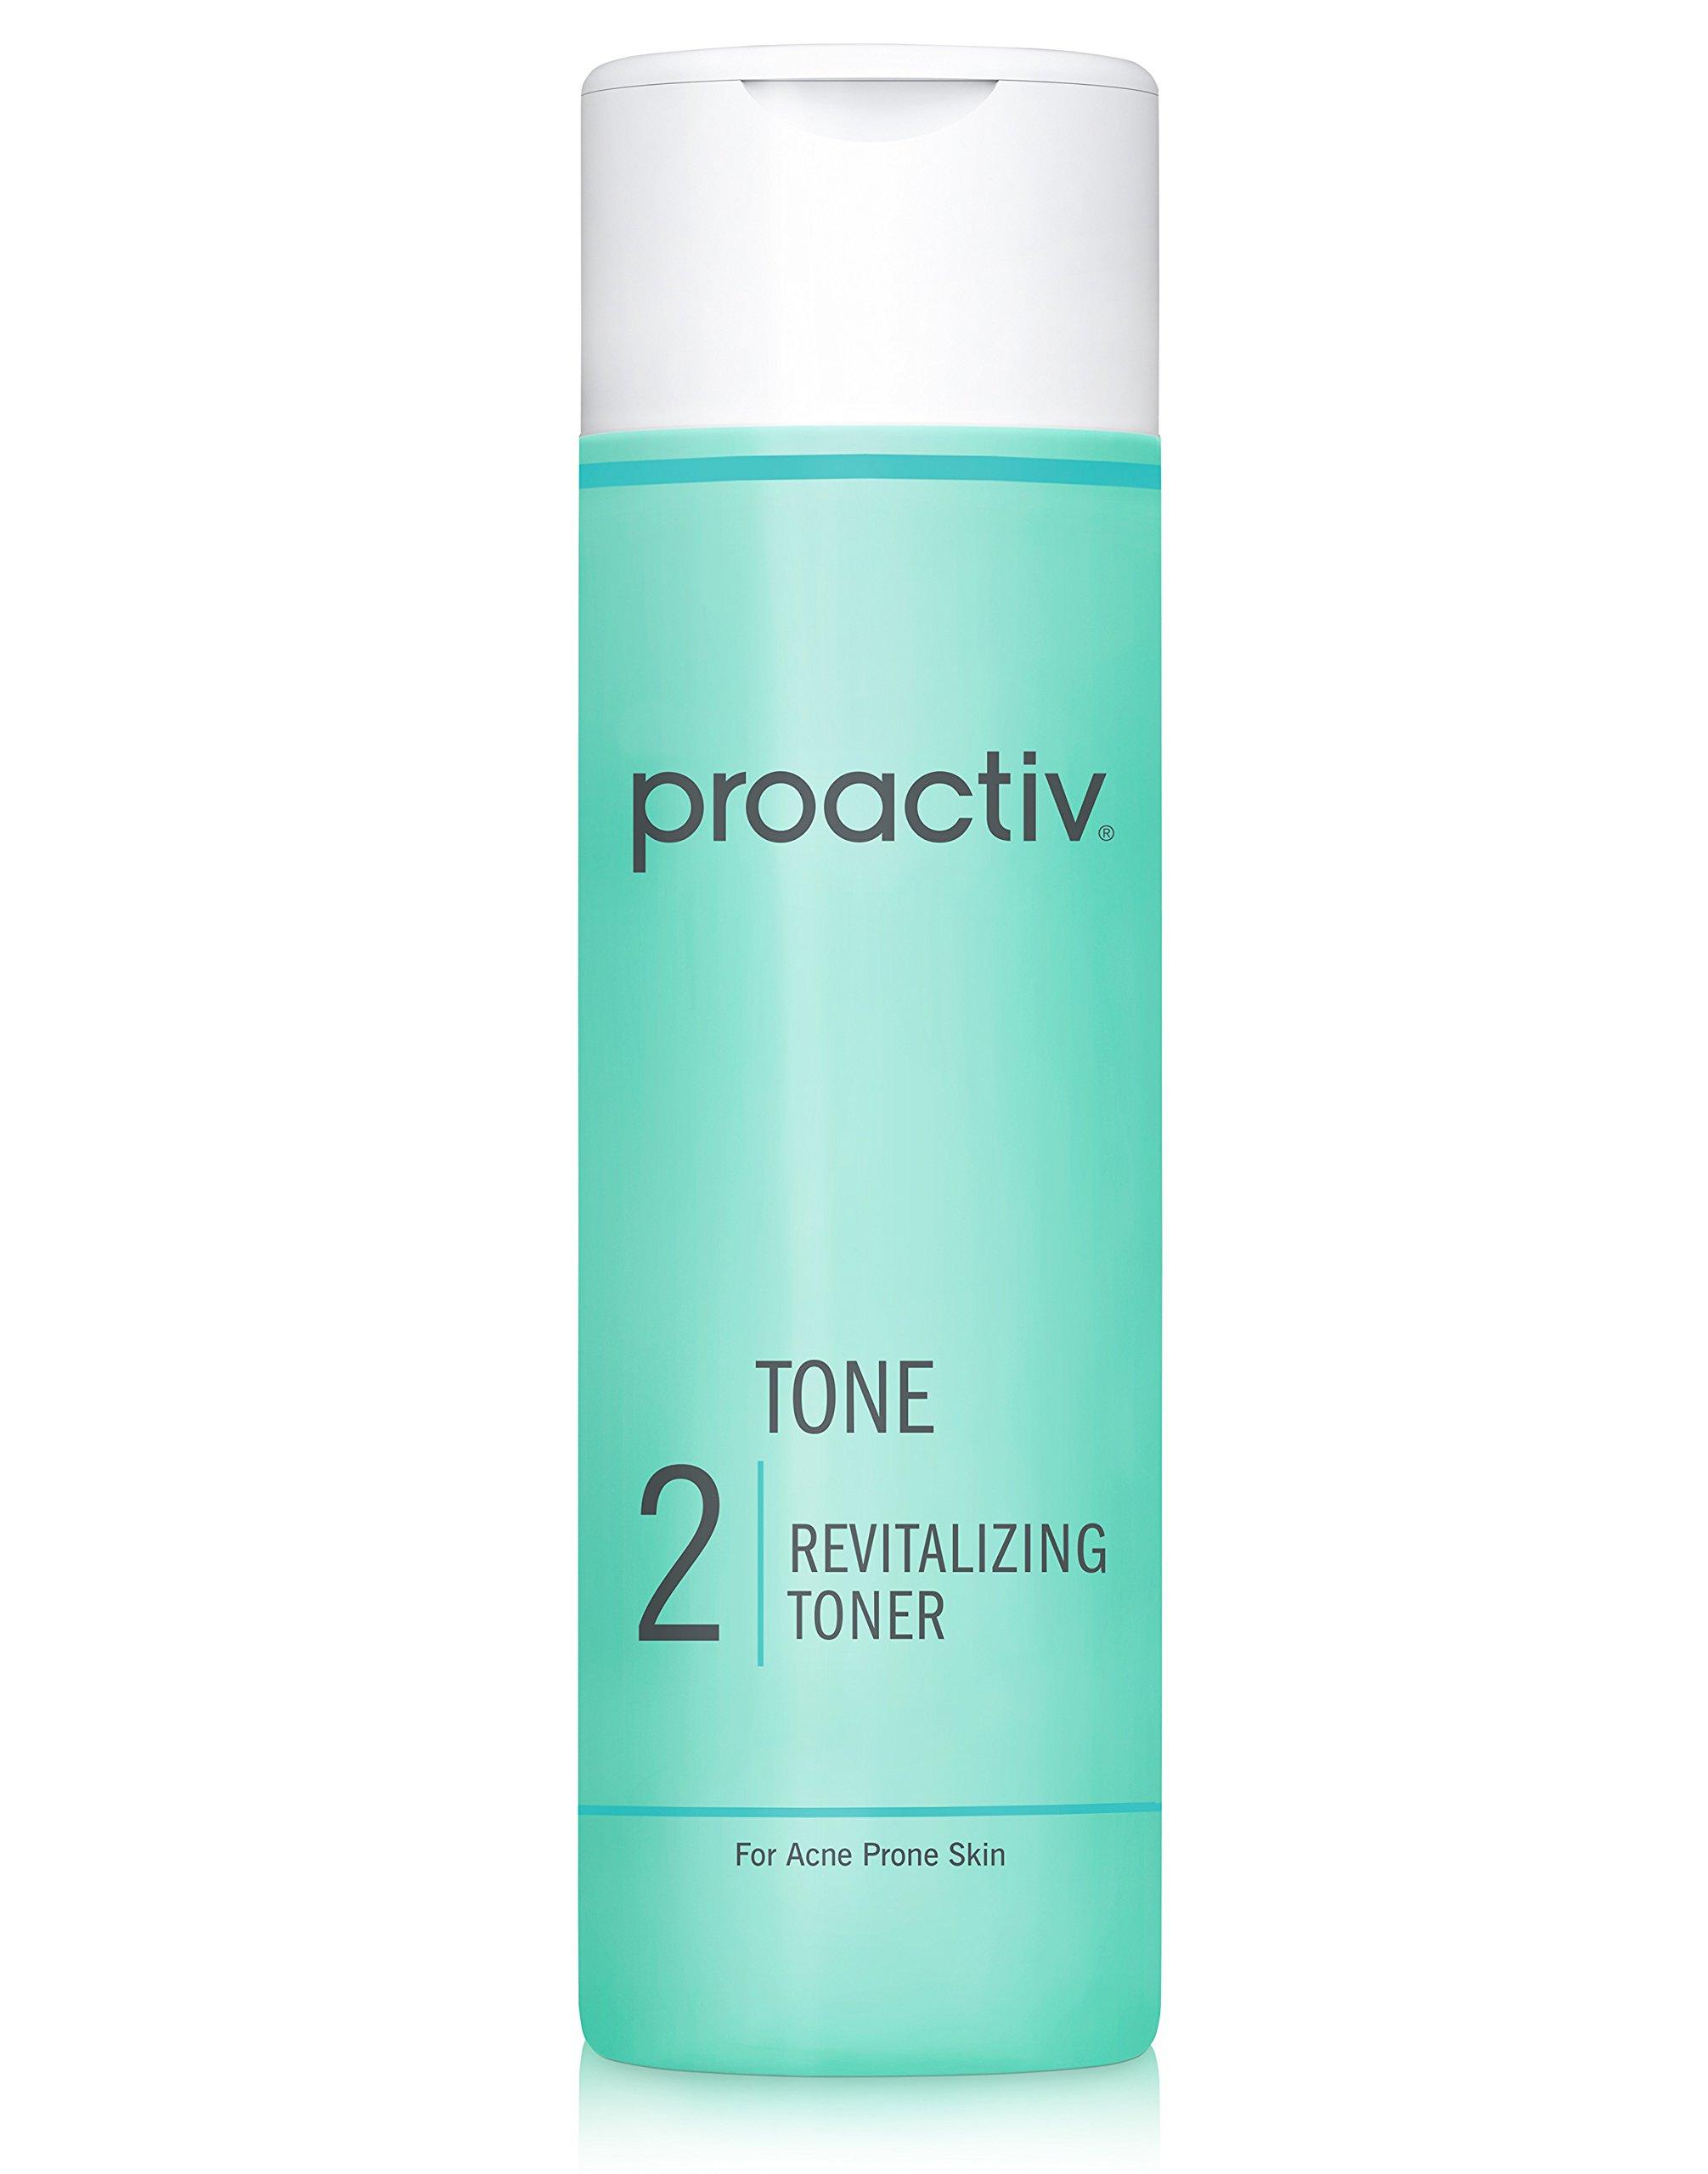 Primavera Life, Balancing Toner 3.4 fl oz Now Foods Clarify & Illuminate Age Transformation Gel Cleanser 8 oz, Pack of 2